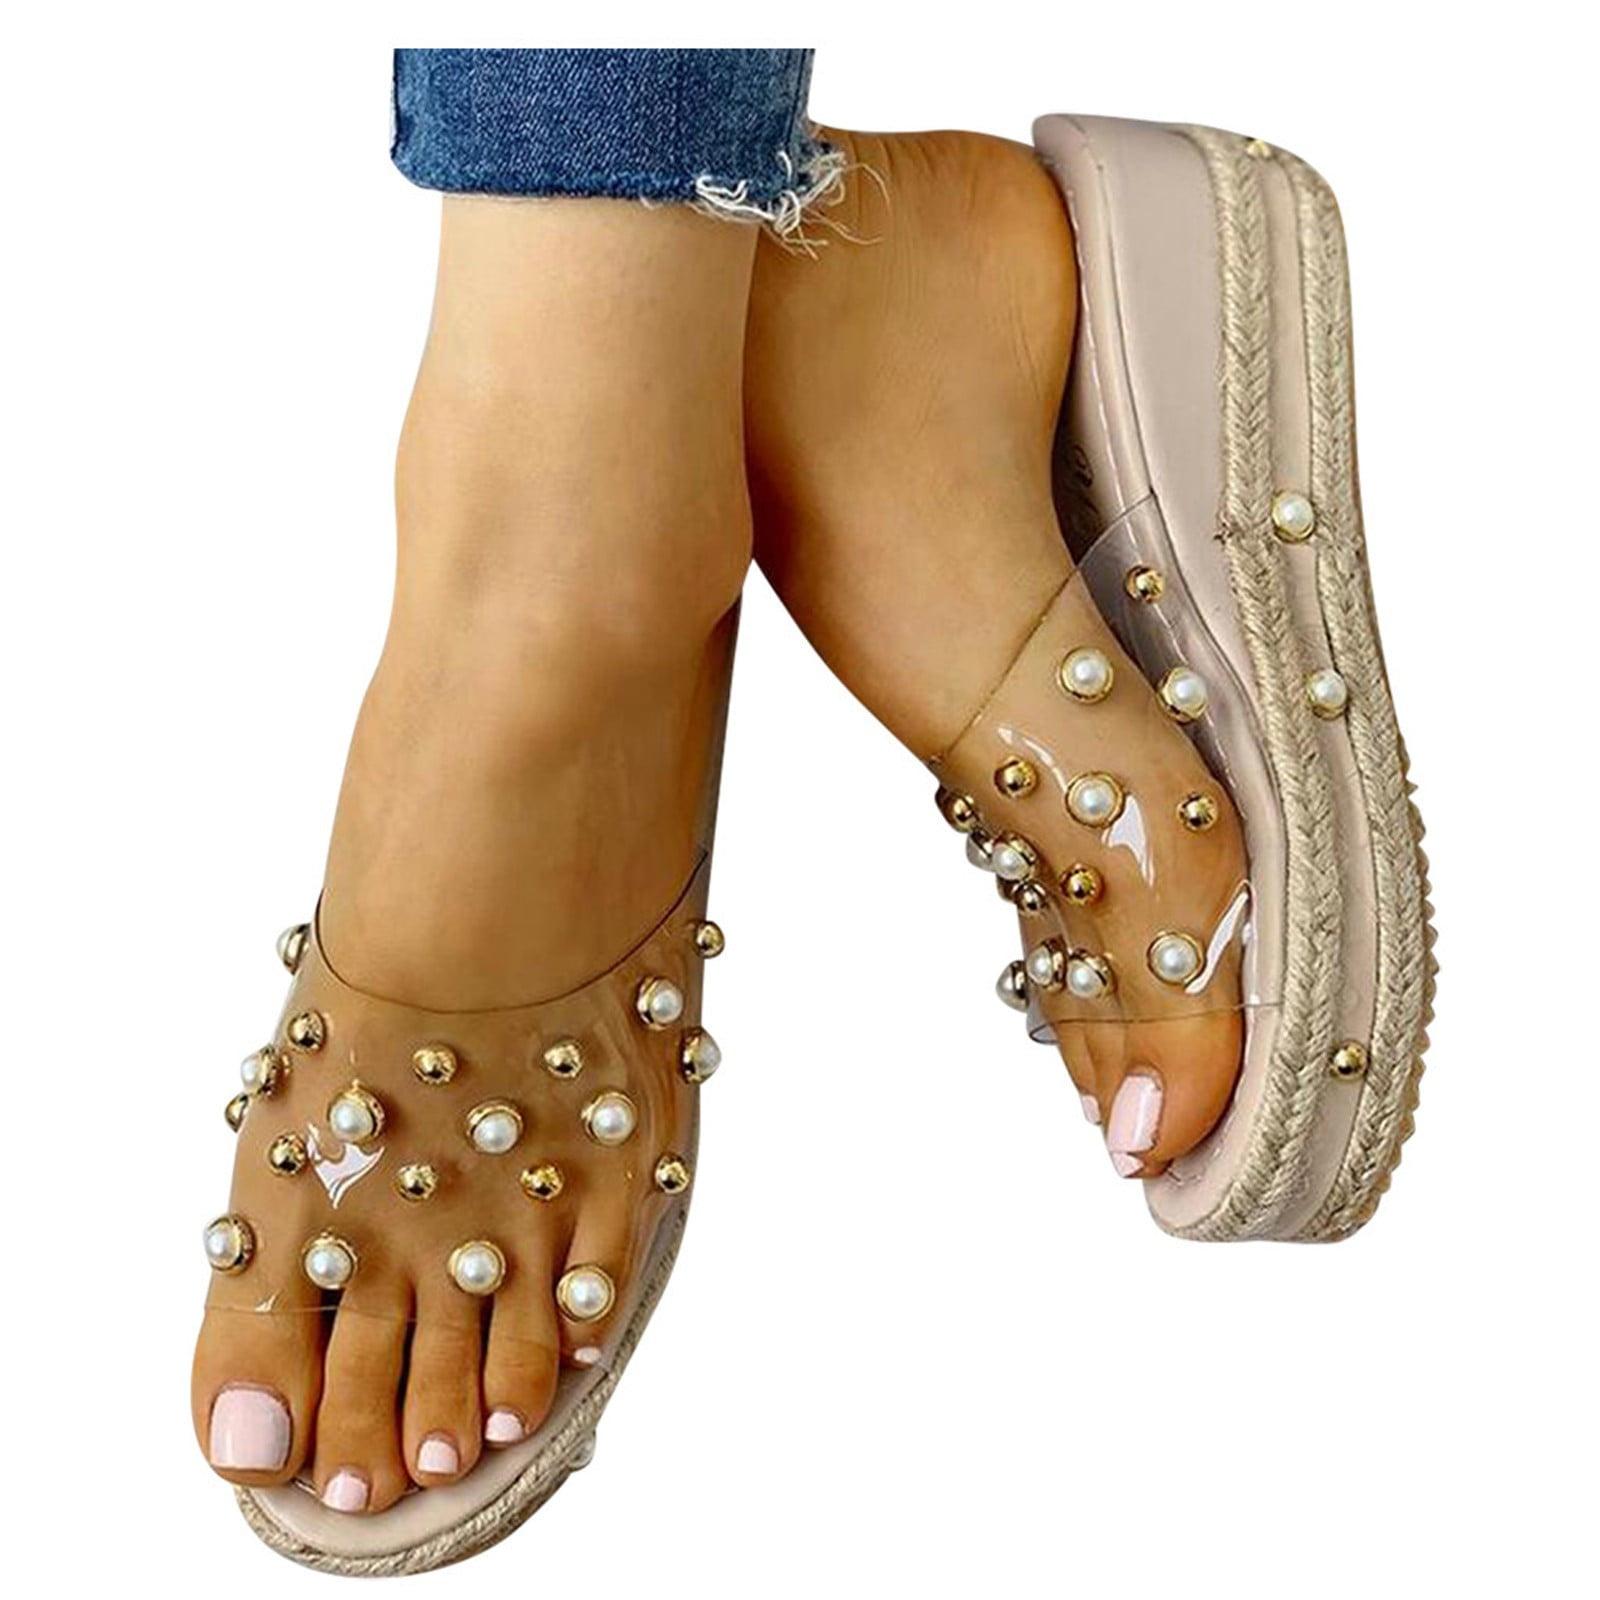 Details about  /Women/'s Transparent Sandals Platform High Heels Open Toe Casual Shoes Slip On